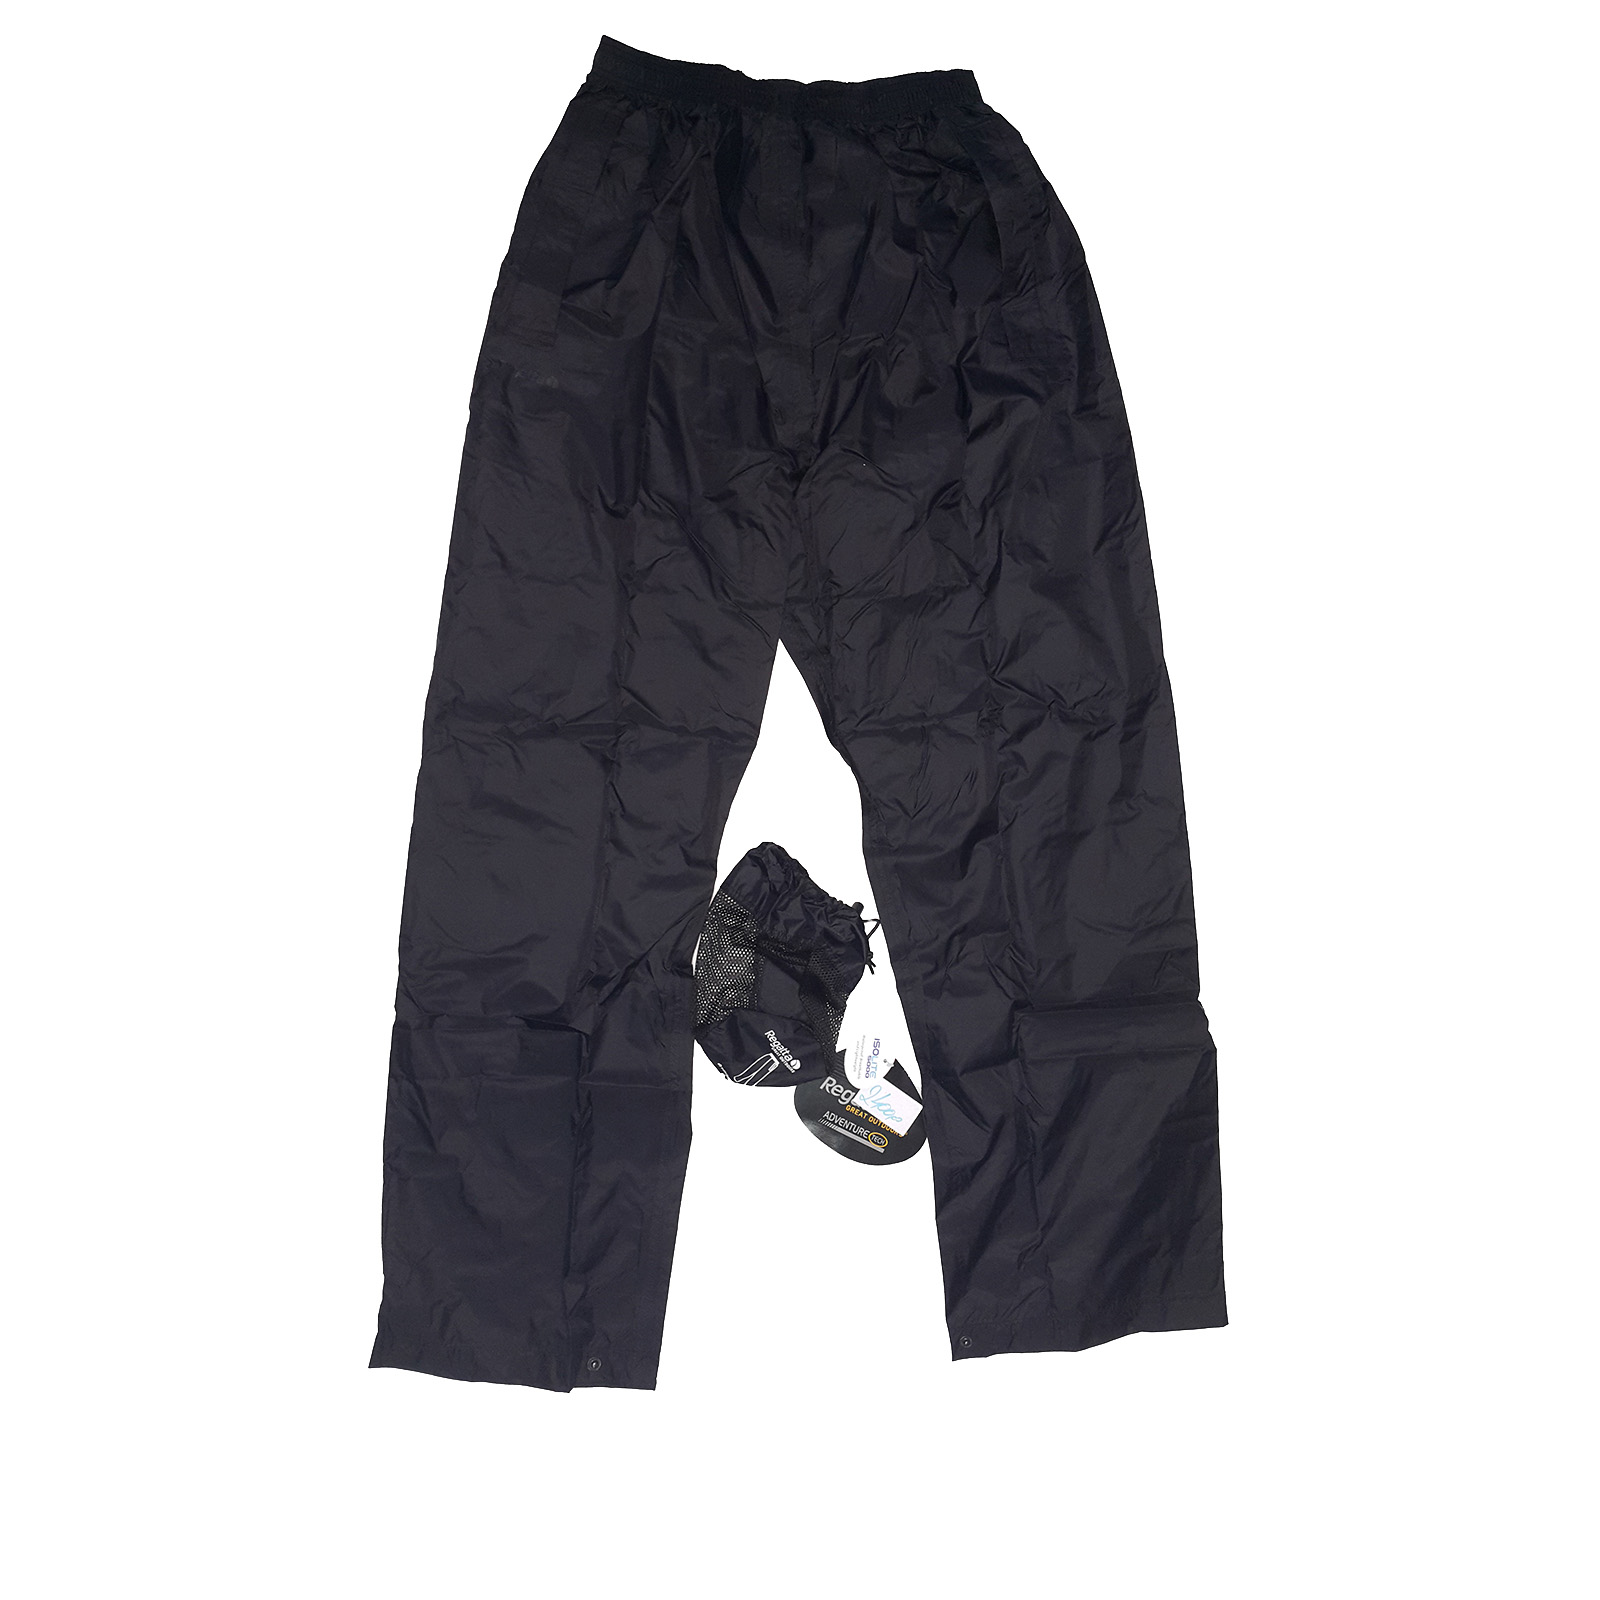 Regata navlaka za pantalone